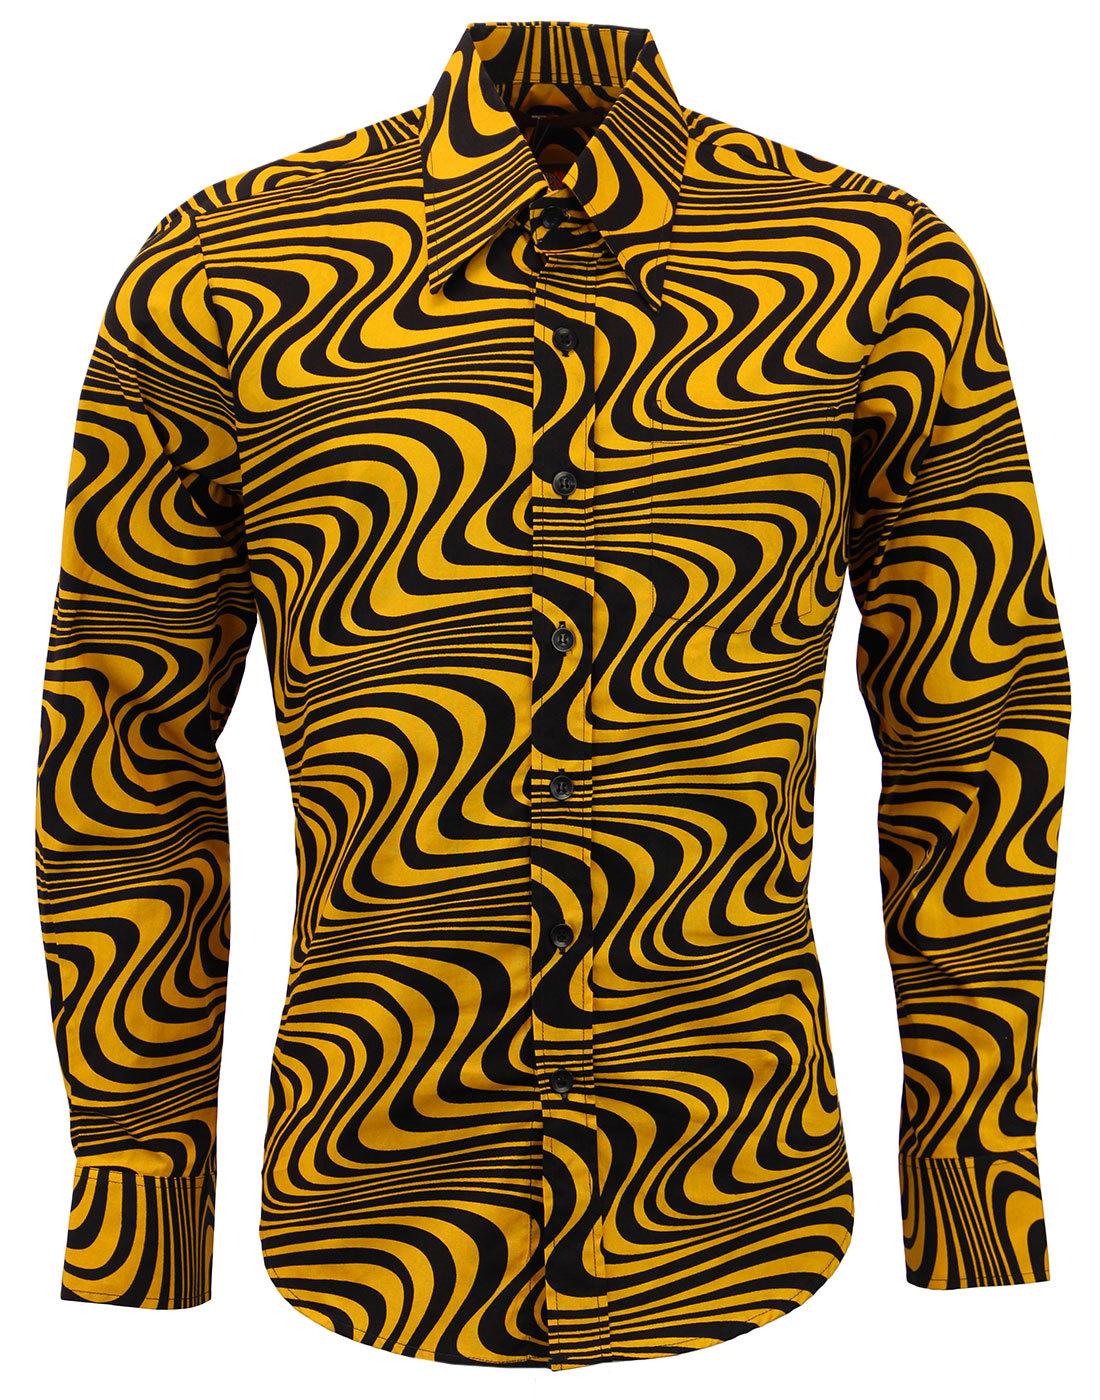 Chenaski retro 70s indie op art wavy mod shirt heatwave chenaski retro 70s mod op art wavy shirt sciox Image collections